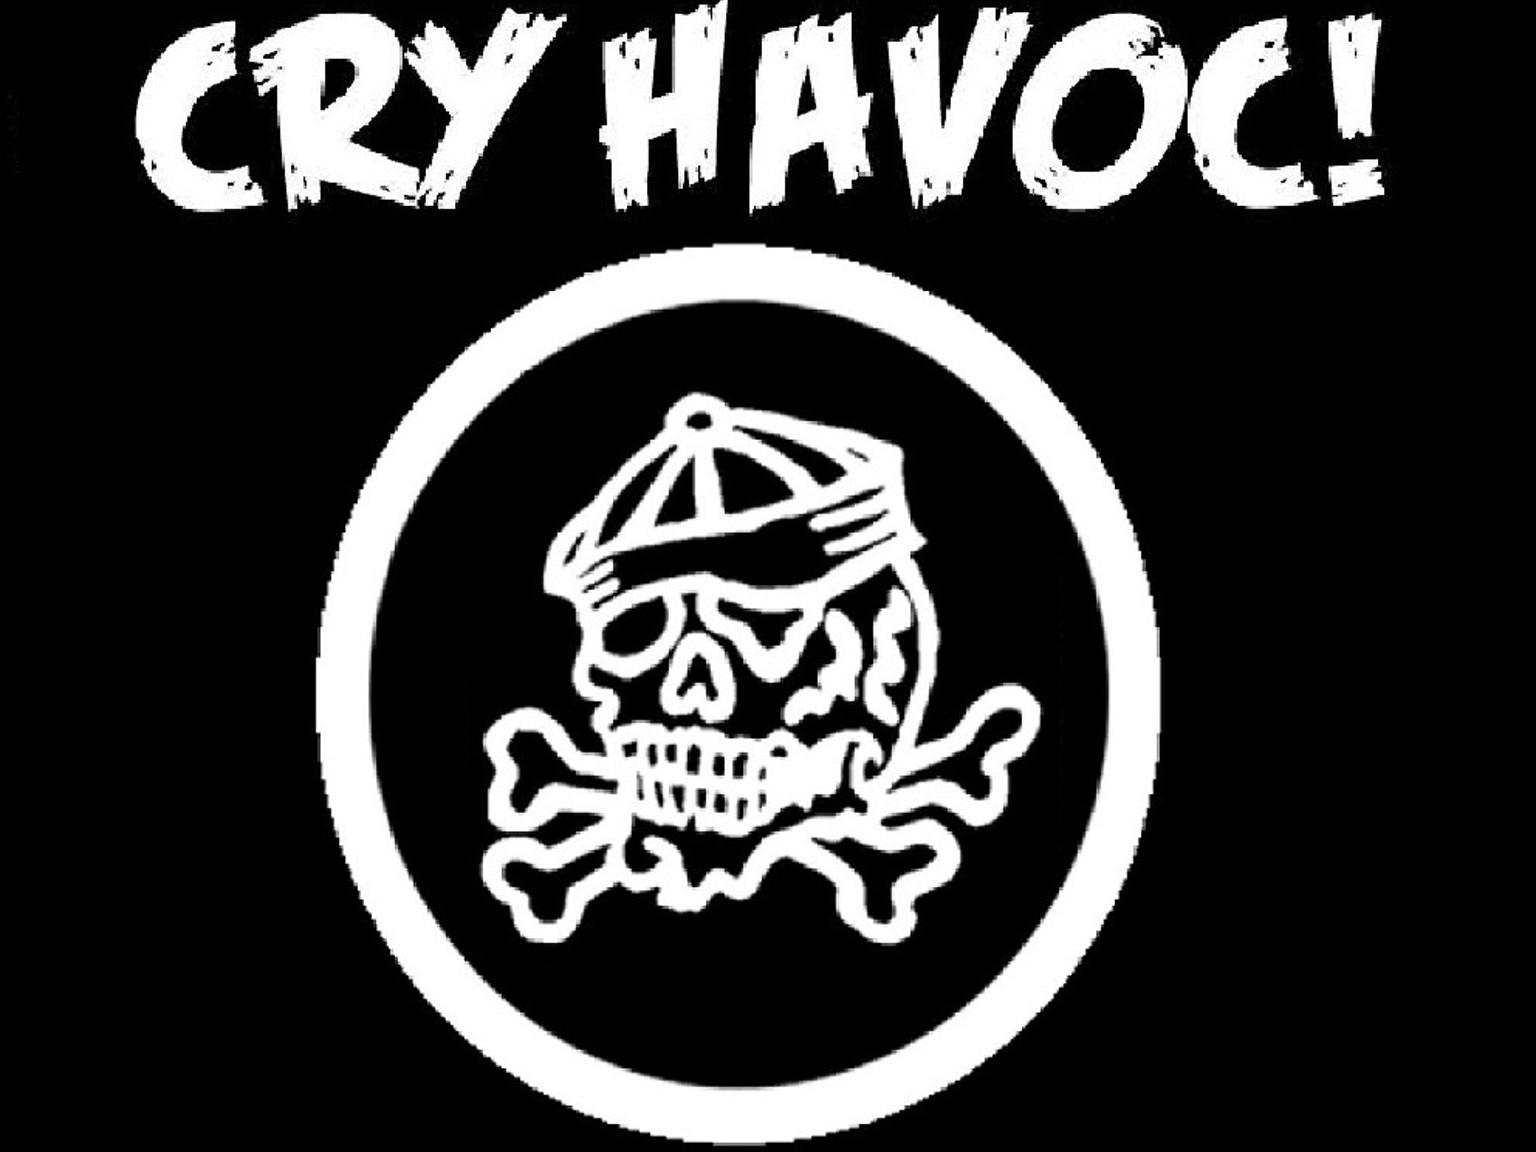 CRY HAVOC! FULL LENGTH RECORD by jonny disaster — Kickstarter